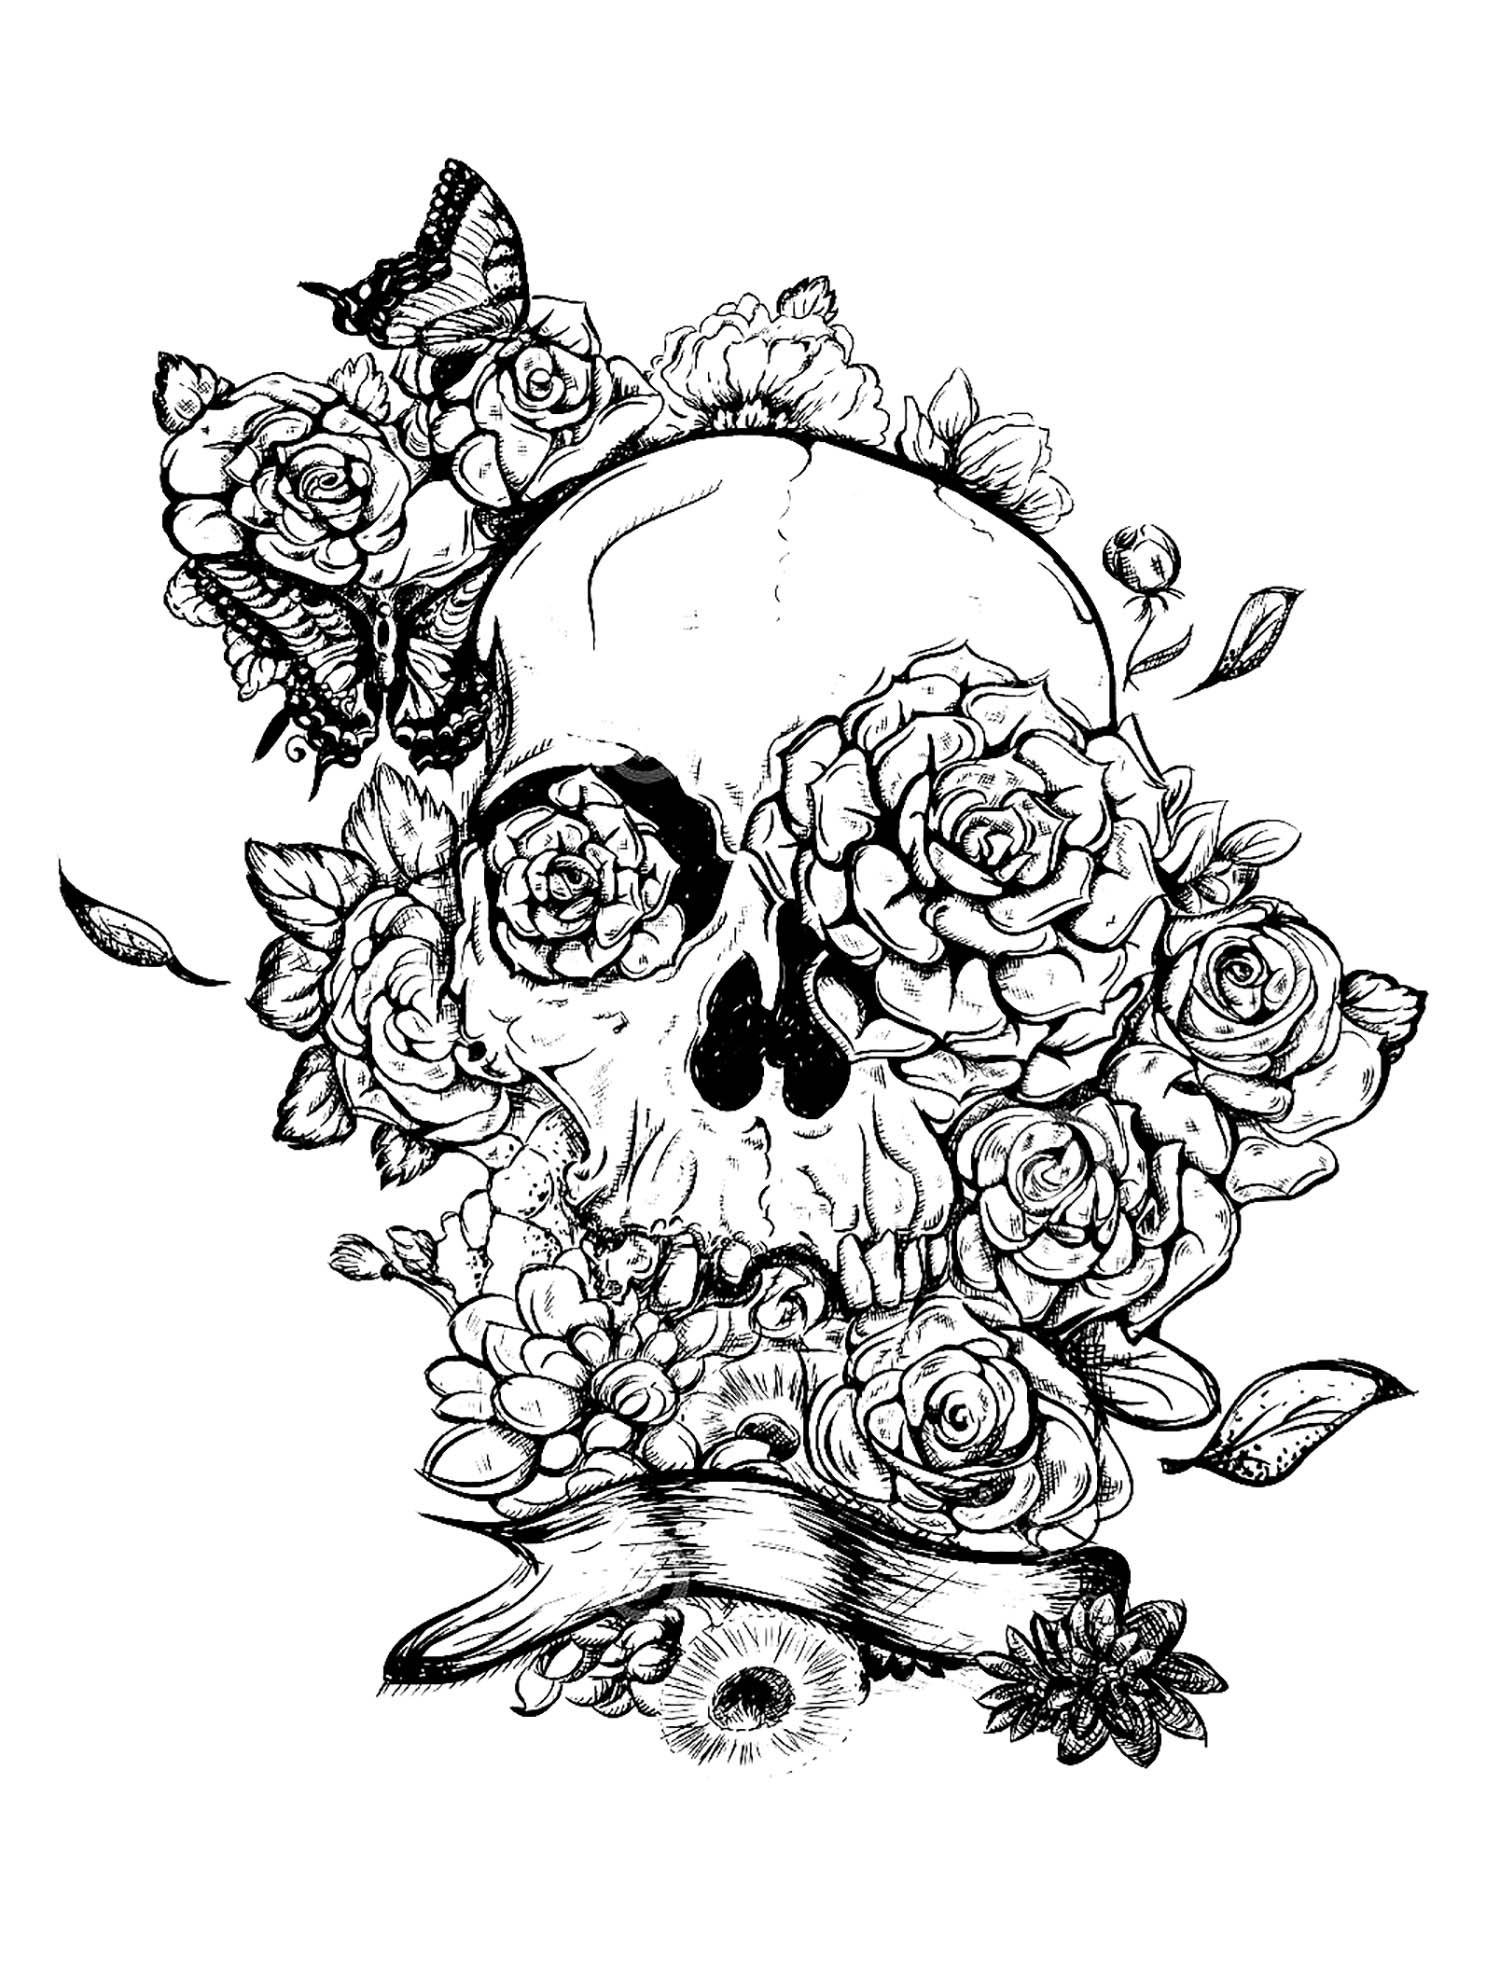 Colorear para adultos : Tatuajes - 29